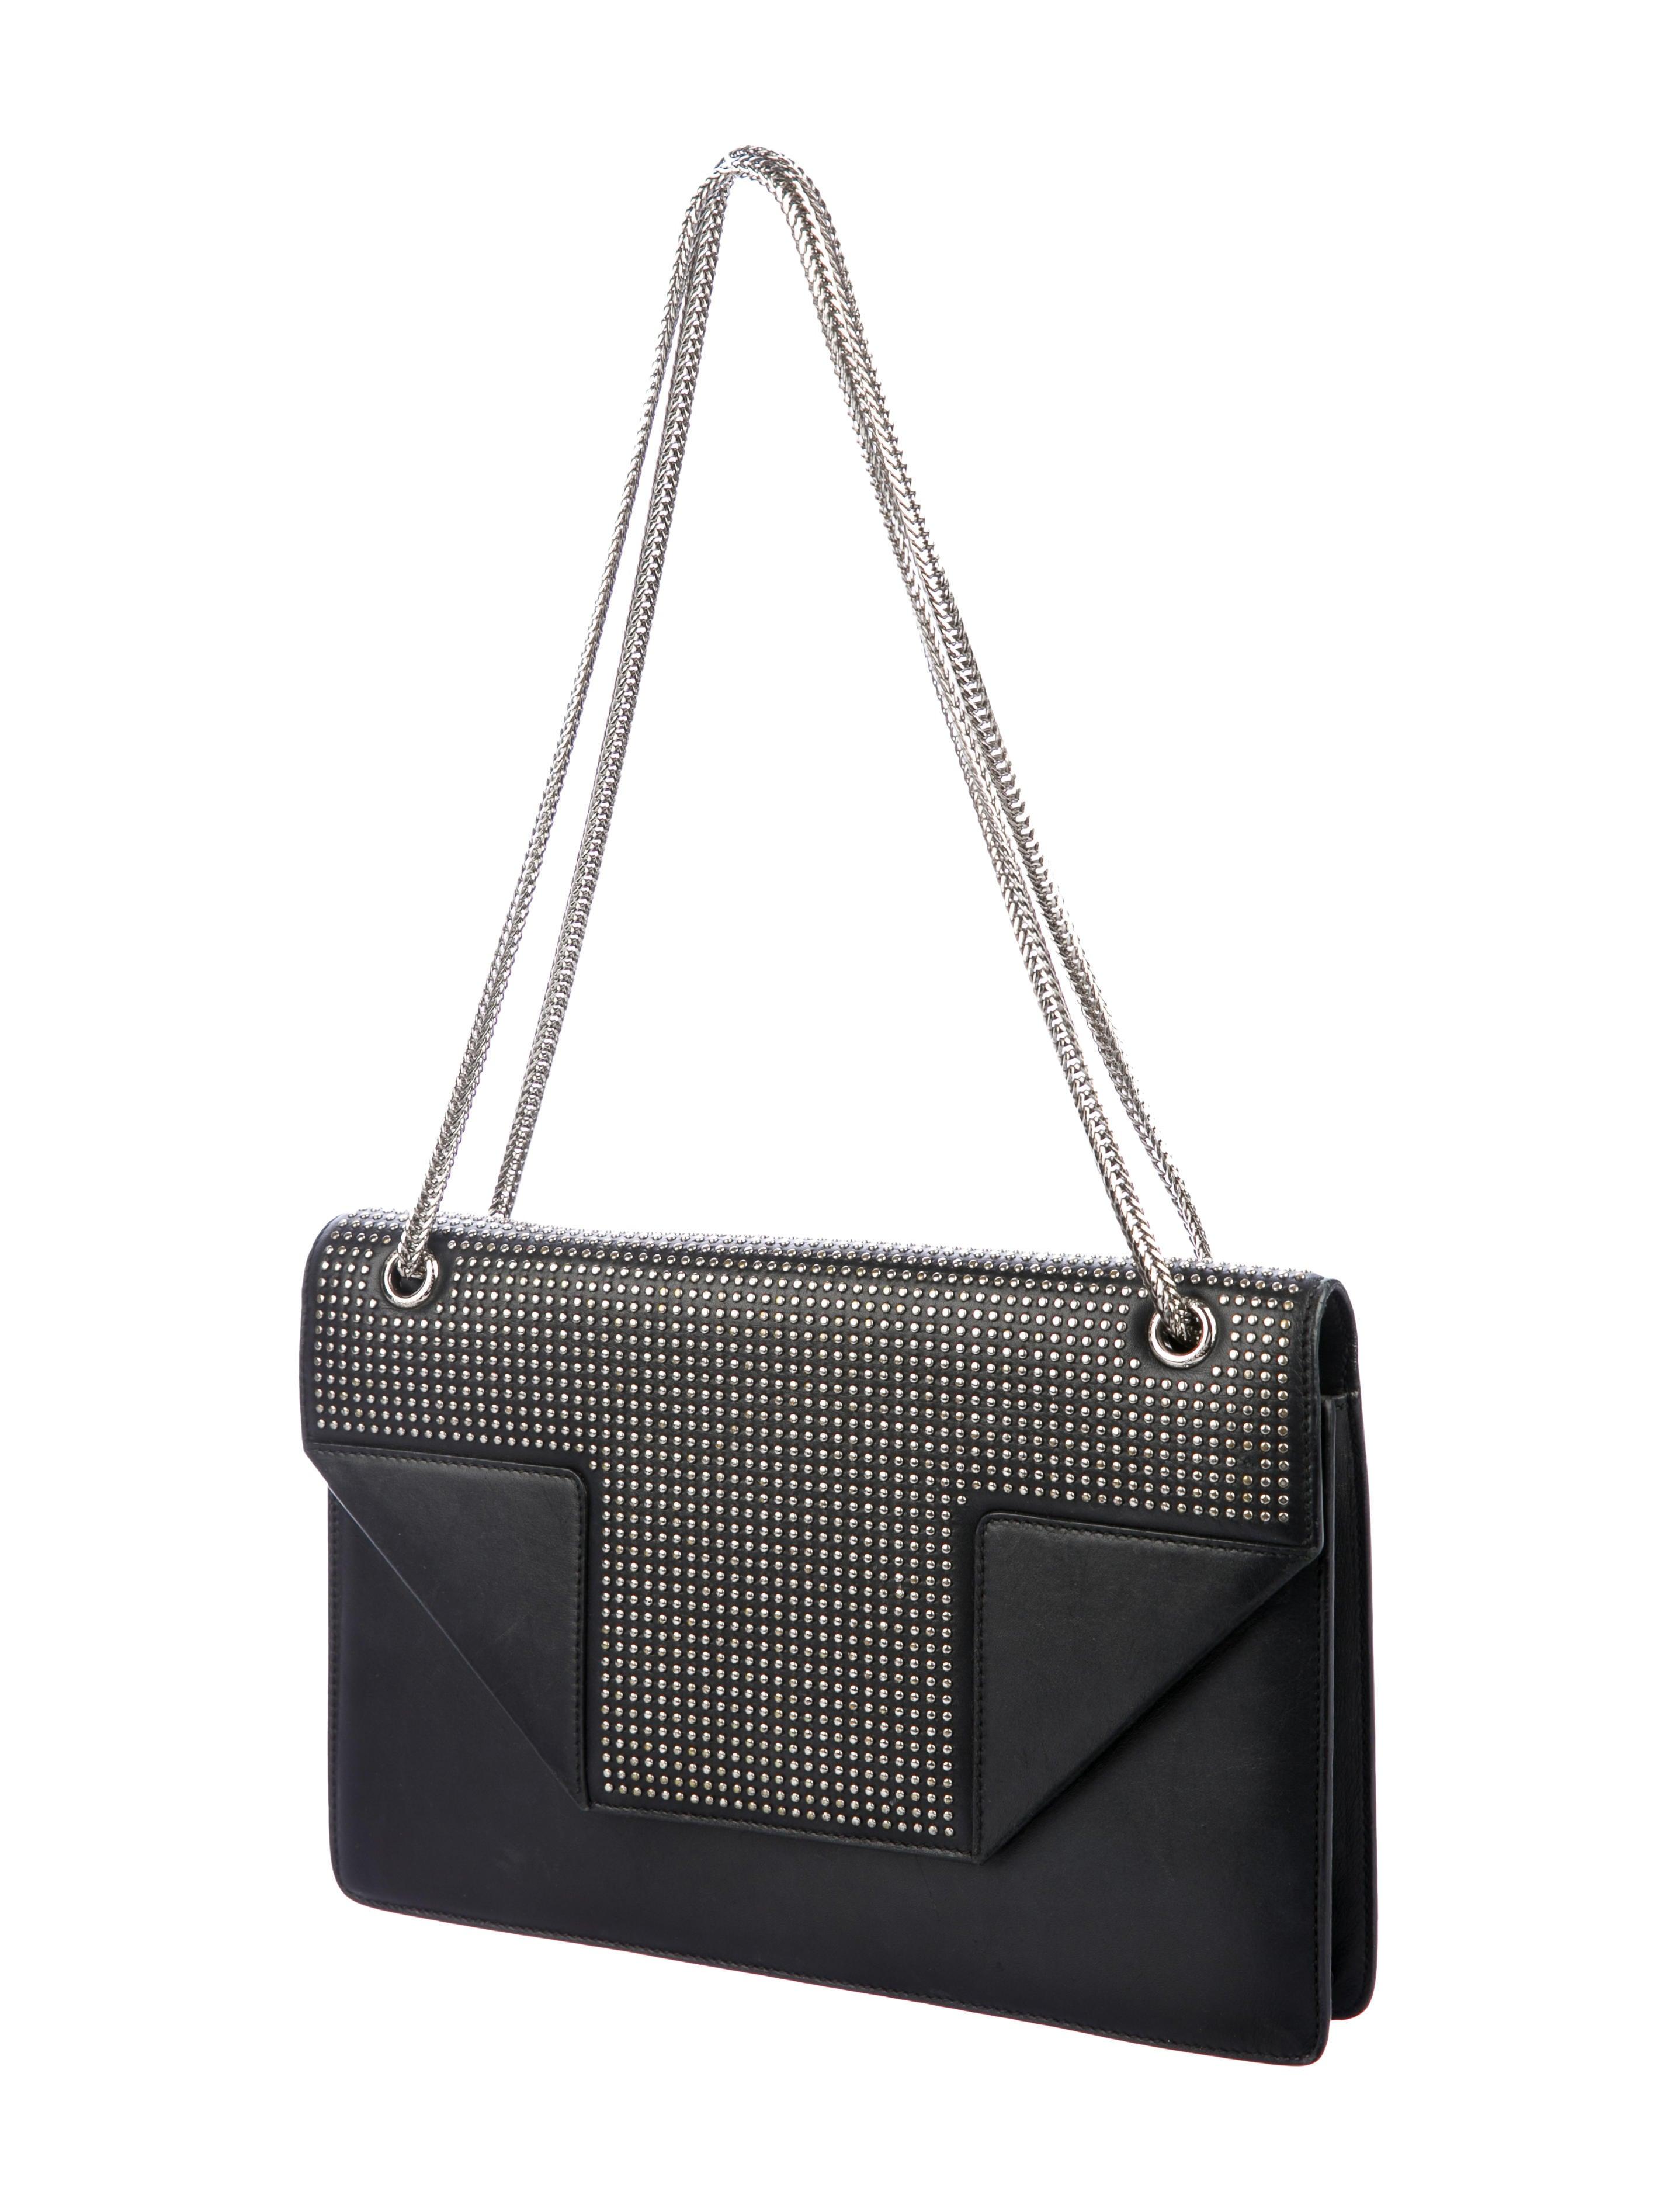 46c548525cac Saint Saint Laurent Laurent Studded Bag Betty v8ndwqFS-shortening ...